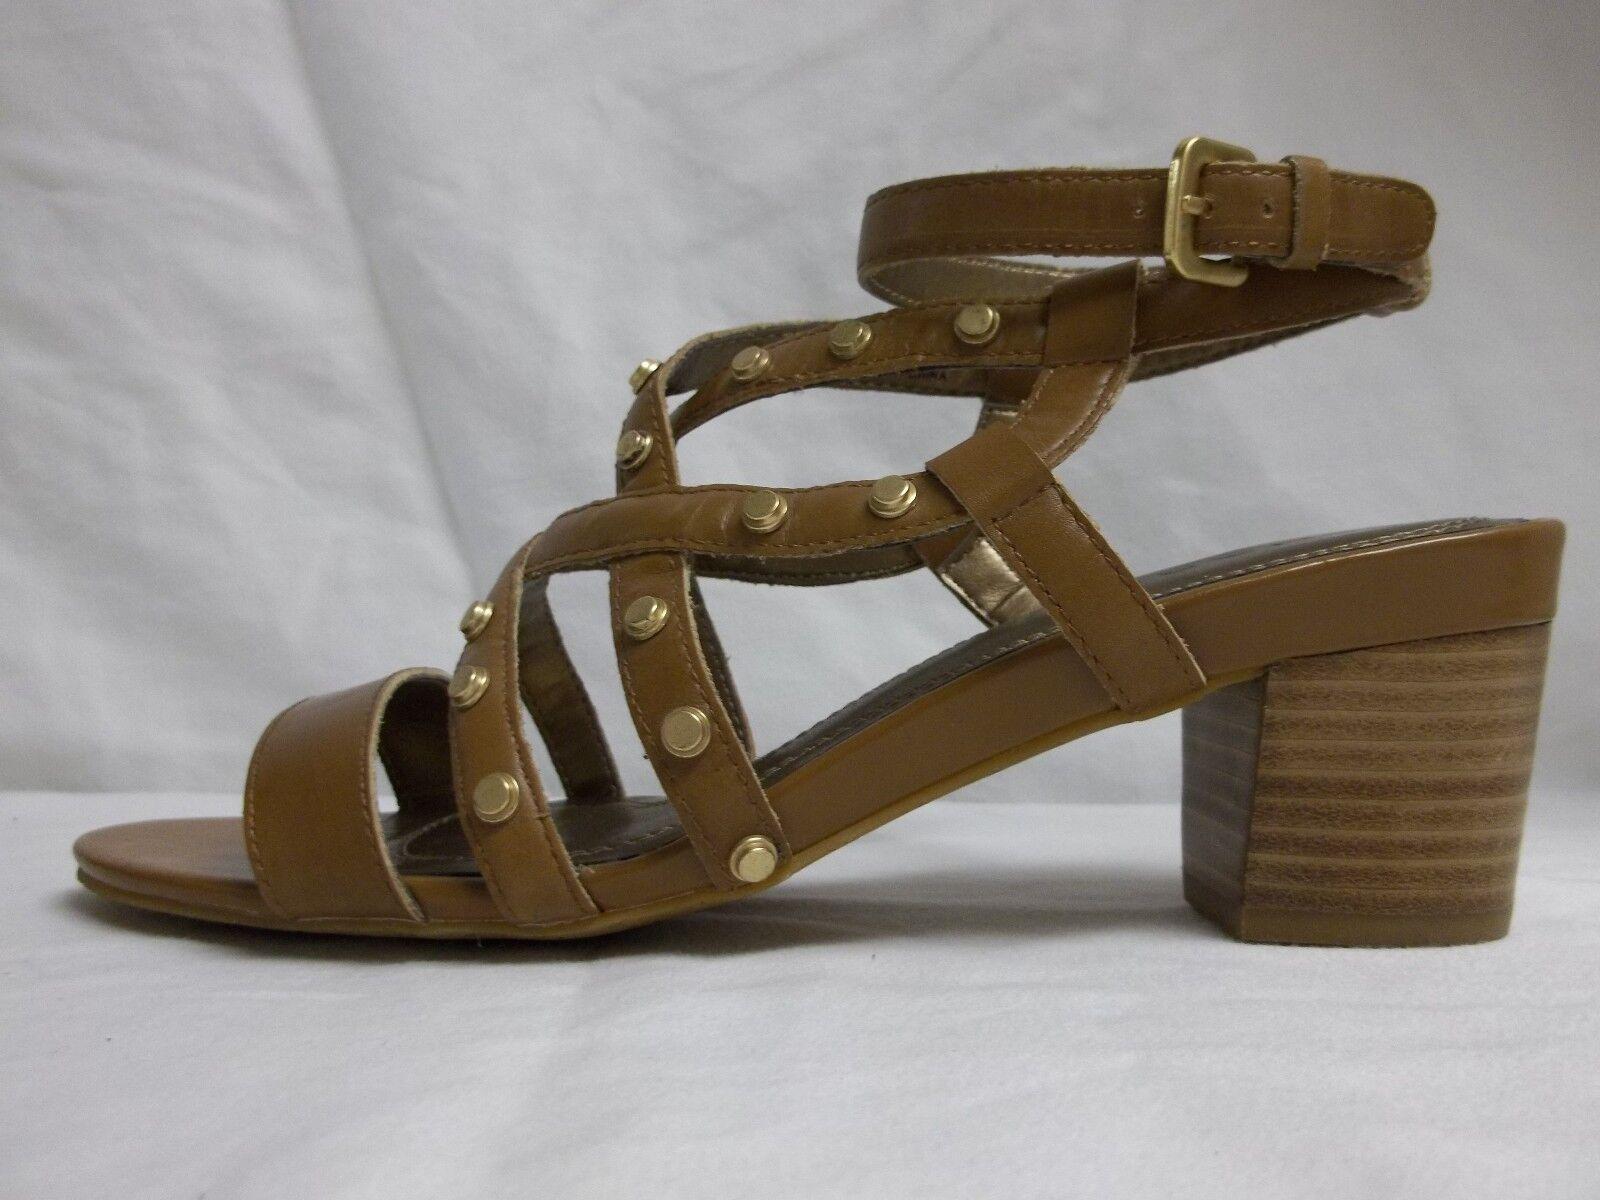 Tahari Sz 8 Open M Kennedy Butterscotch Leder Open 8 Toe Heels New Damenschuhe Schuhes NWOB 5c66c1